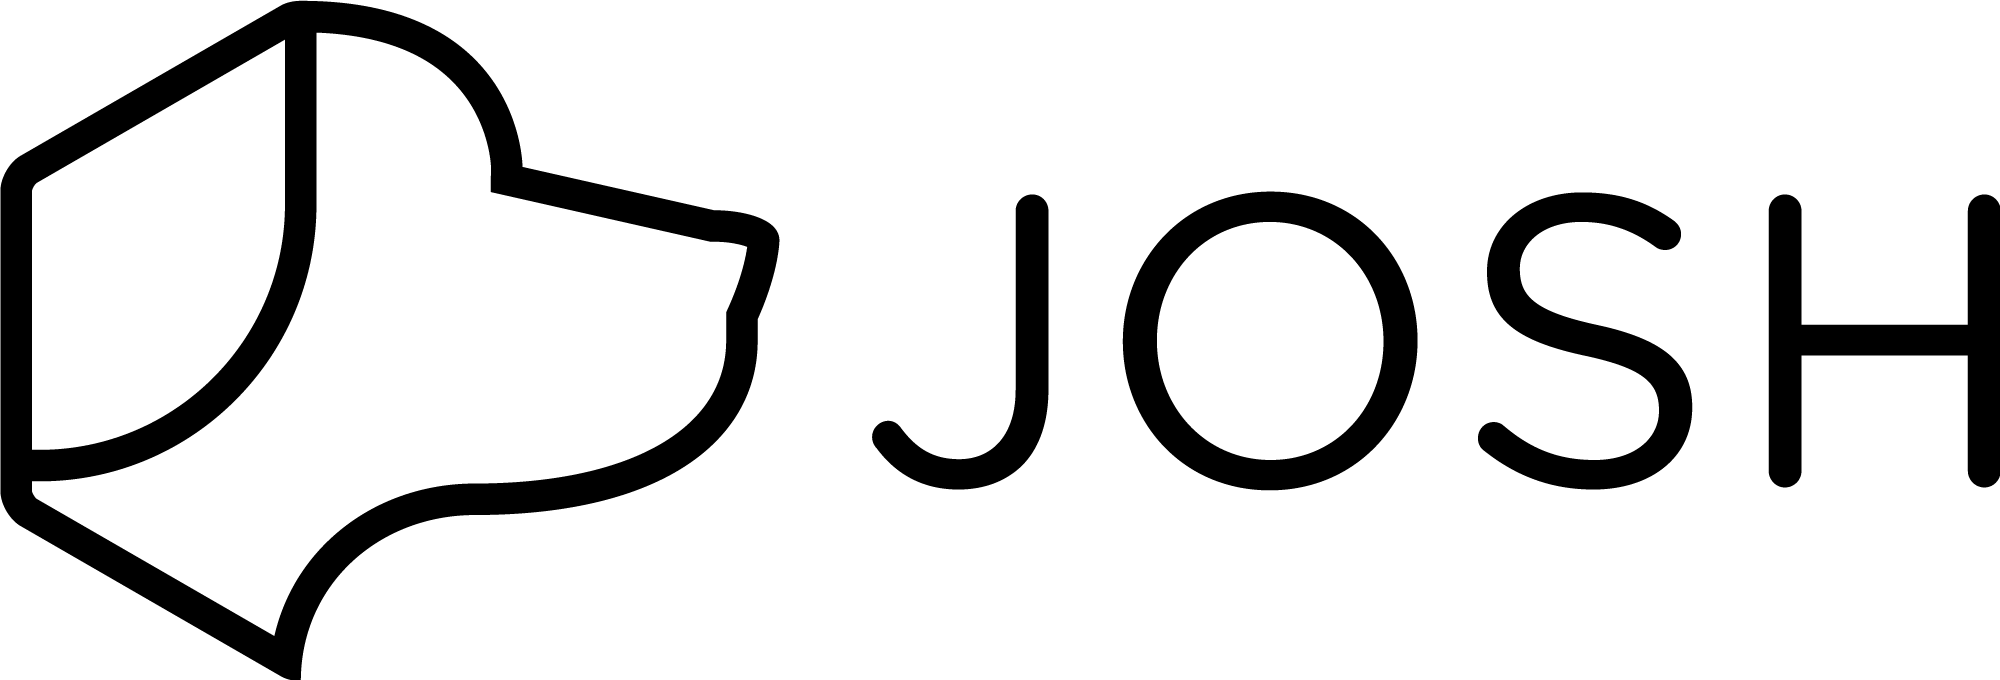 1_Logo-Black_preview.png